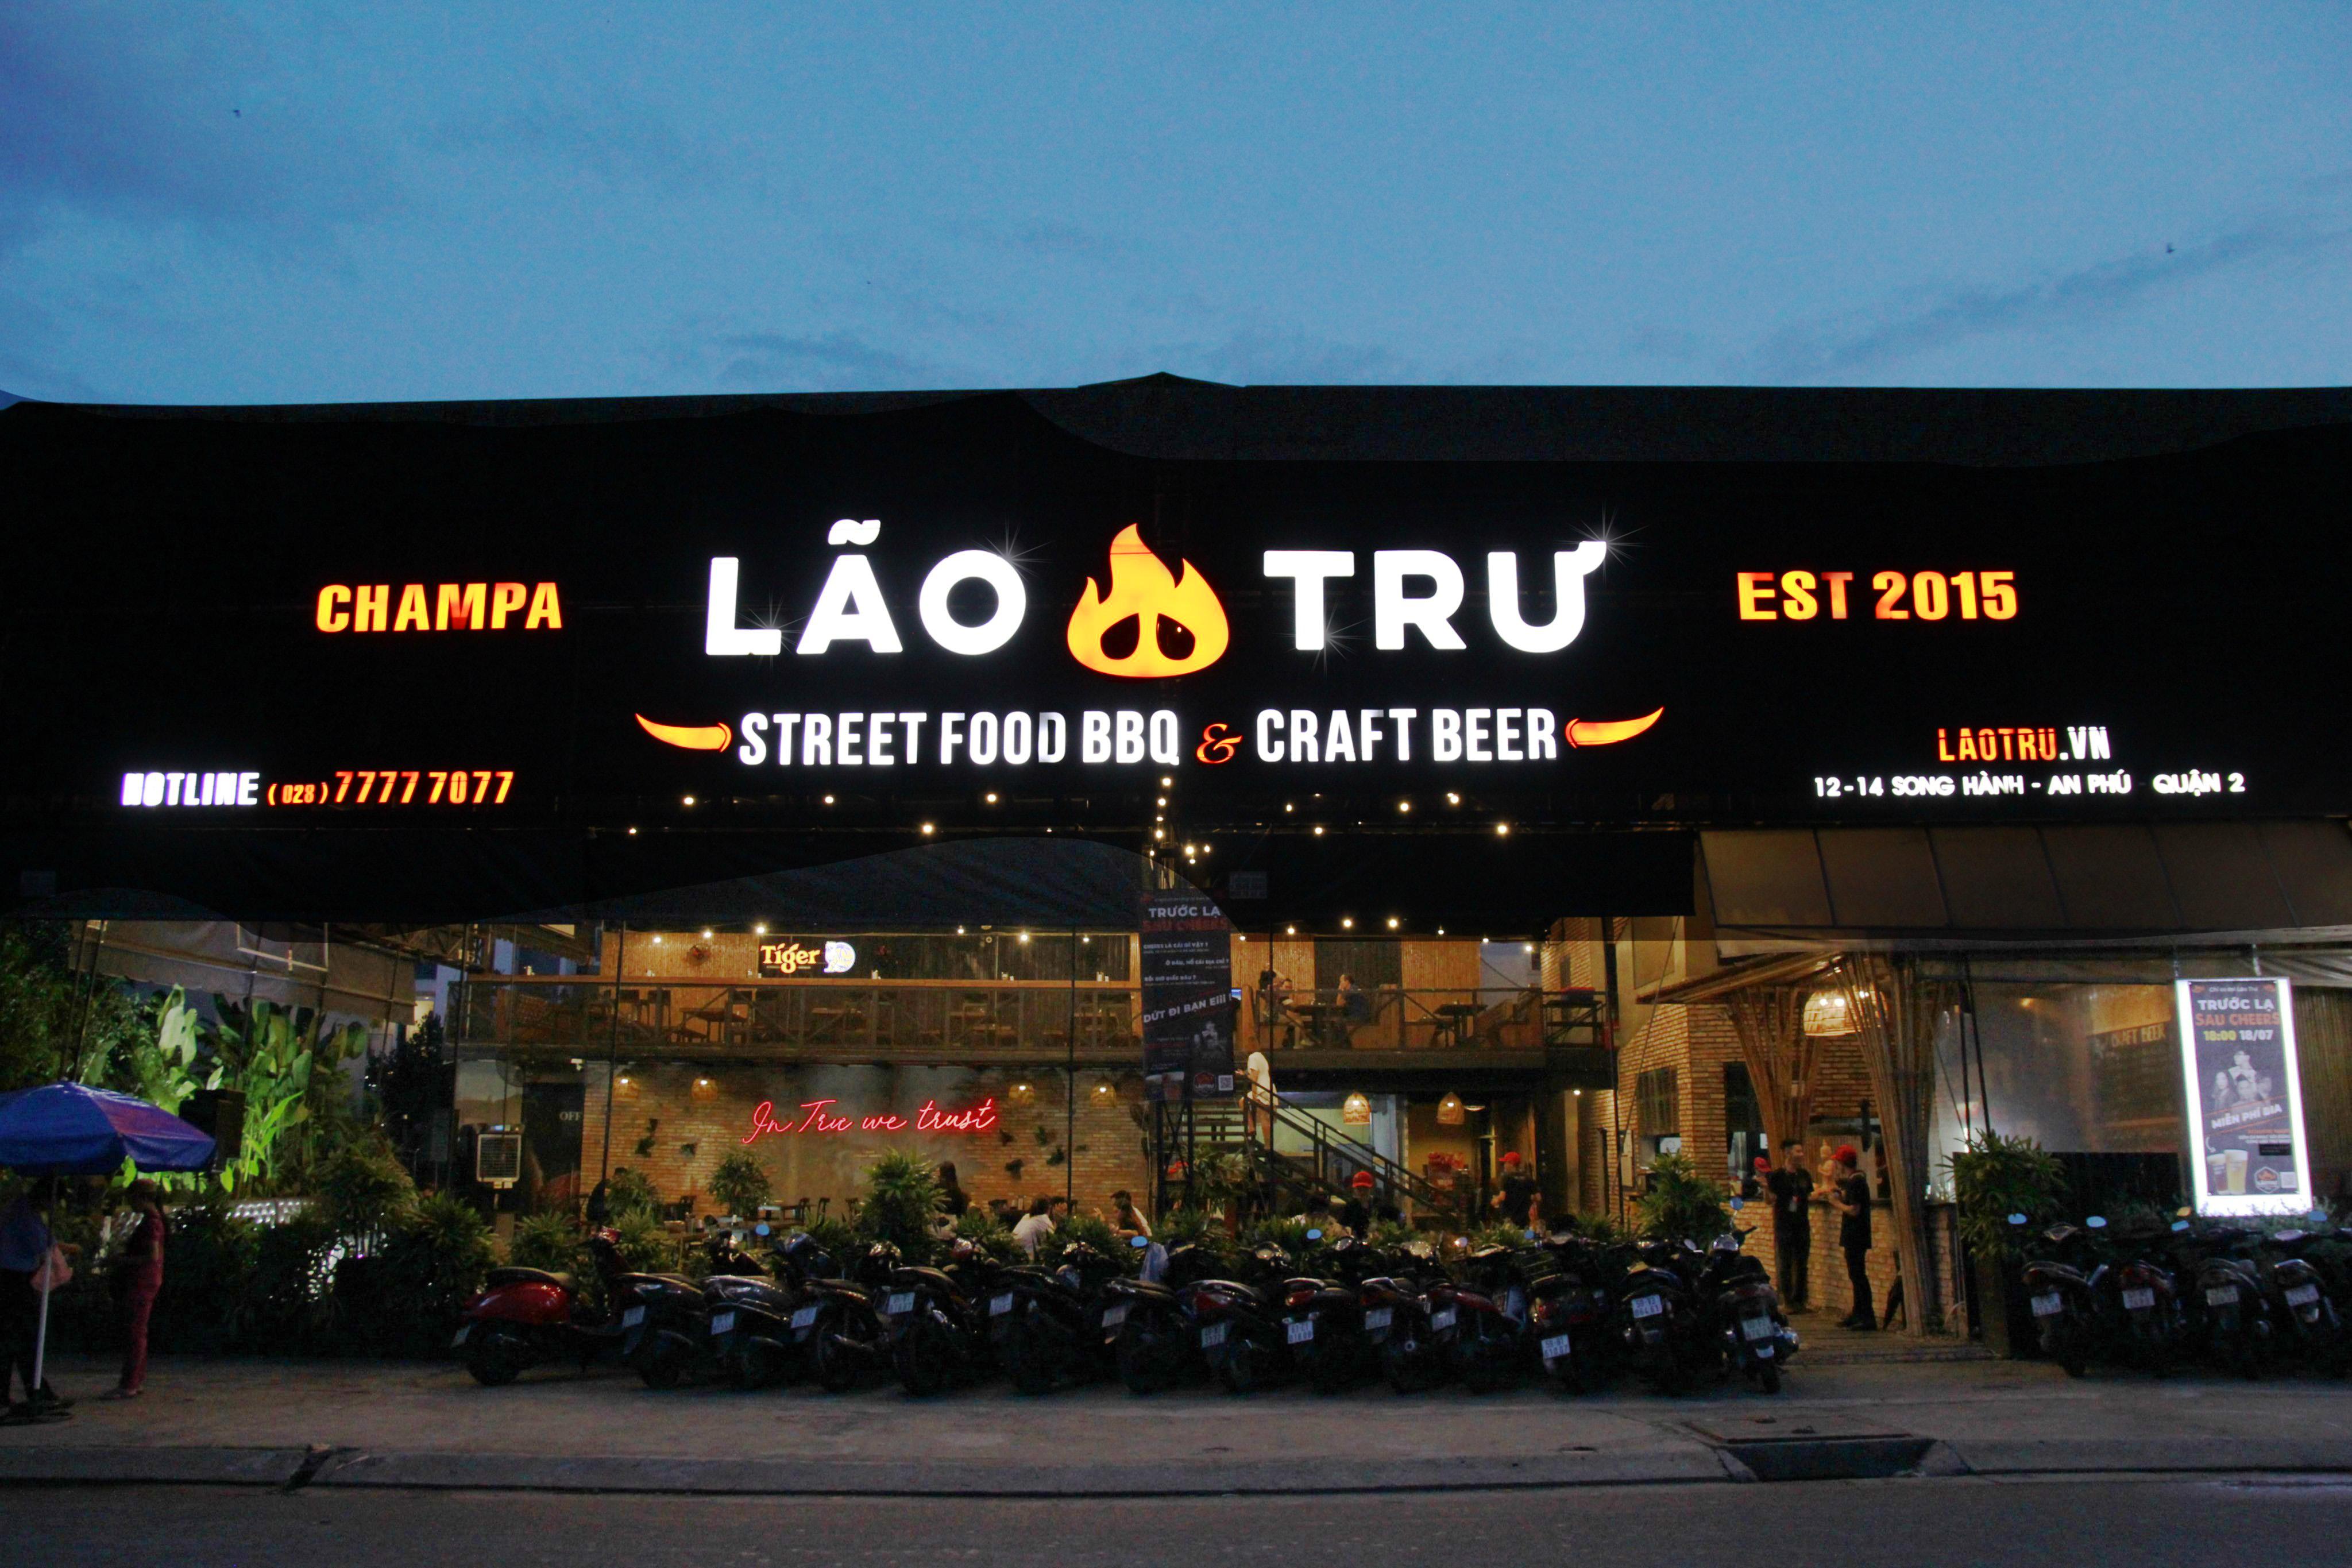 Lão trư – Street Food BBQ & Beer